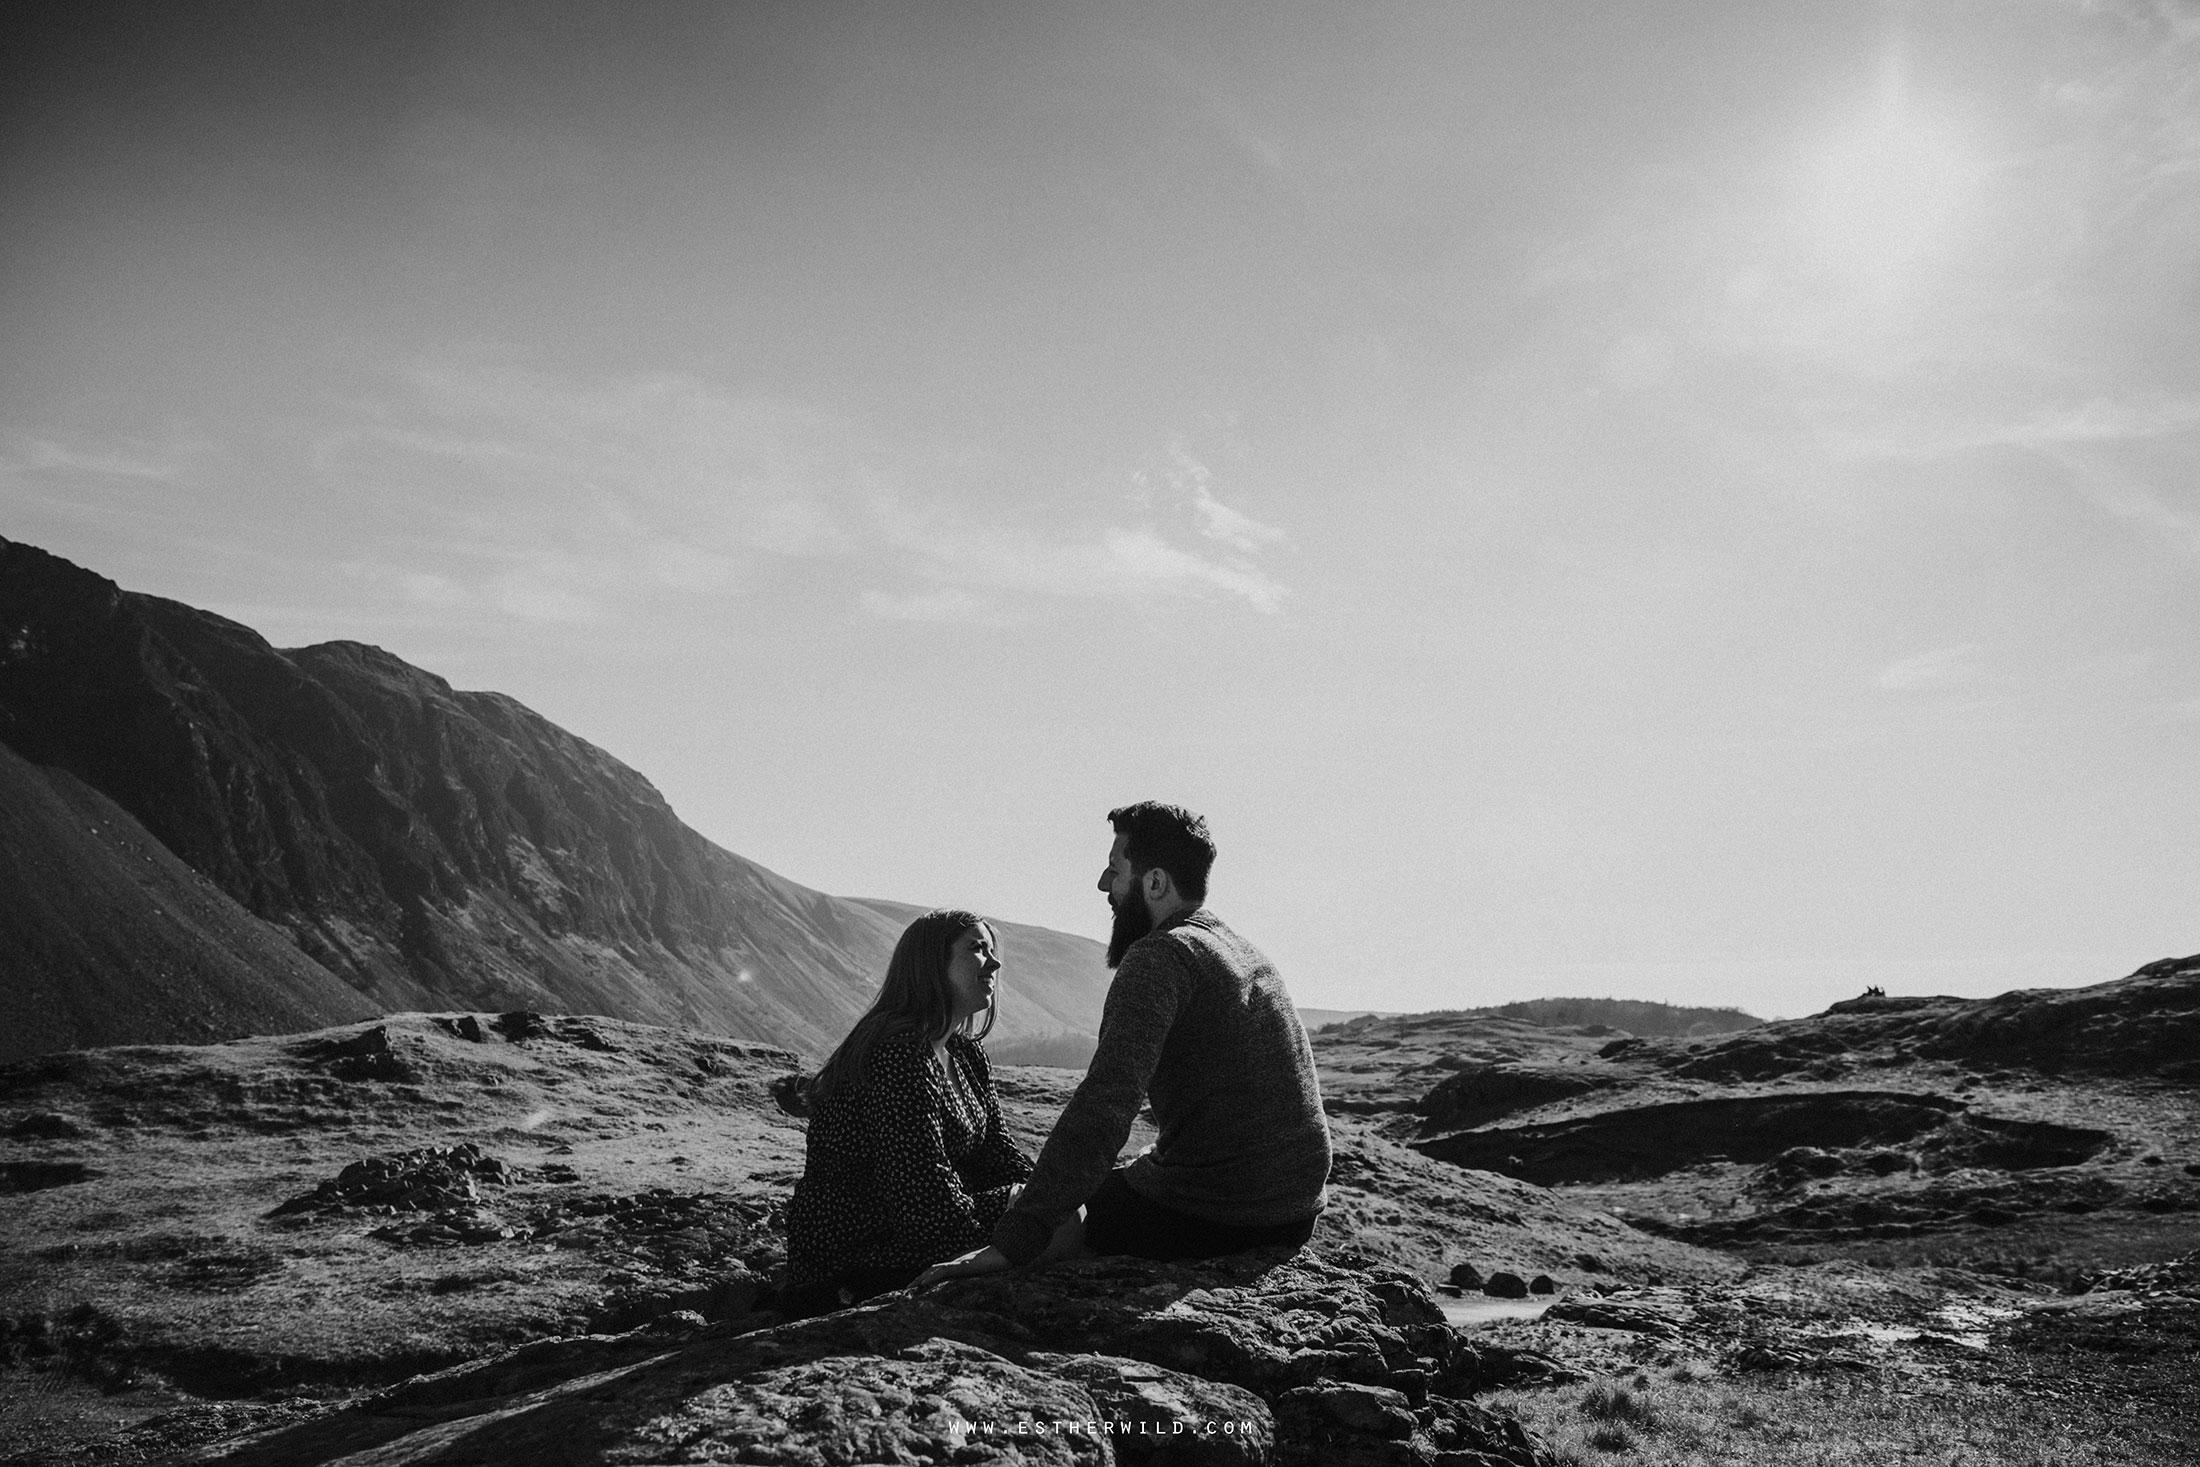 Cumbria_Lake_District_Wasdale_Wedding_Photographer_Destination_Engagement_Anniversary_Esther_Wild_IMG_3404.jpg